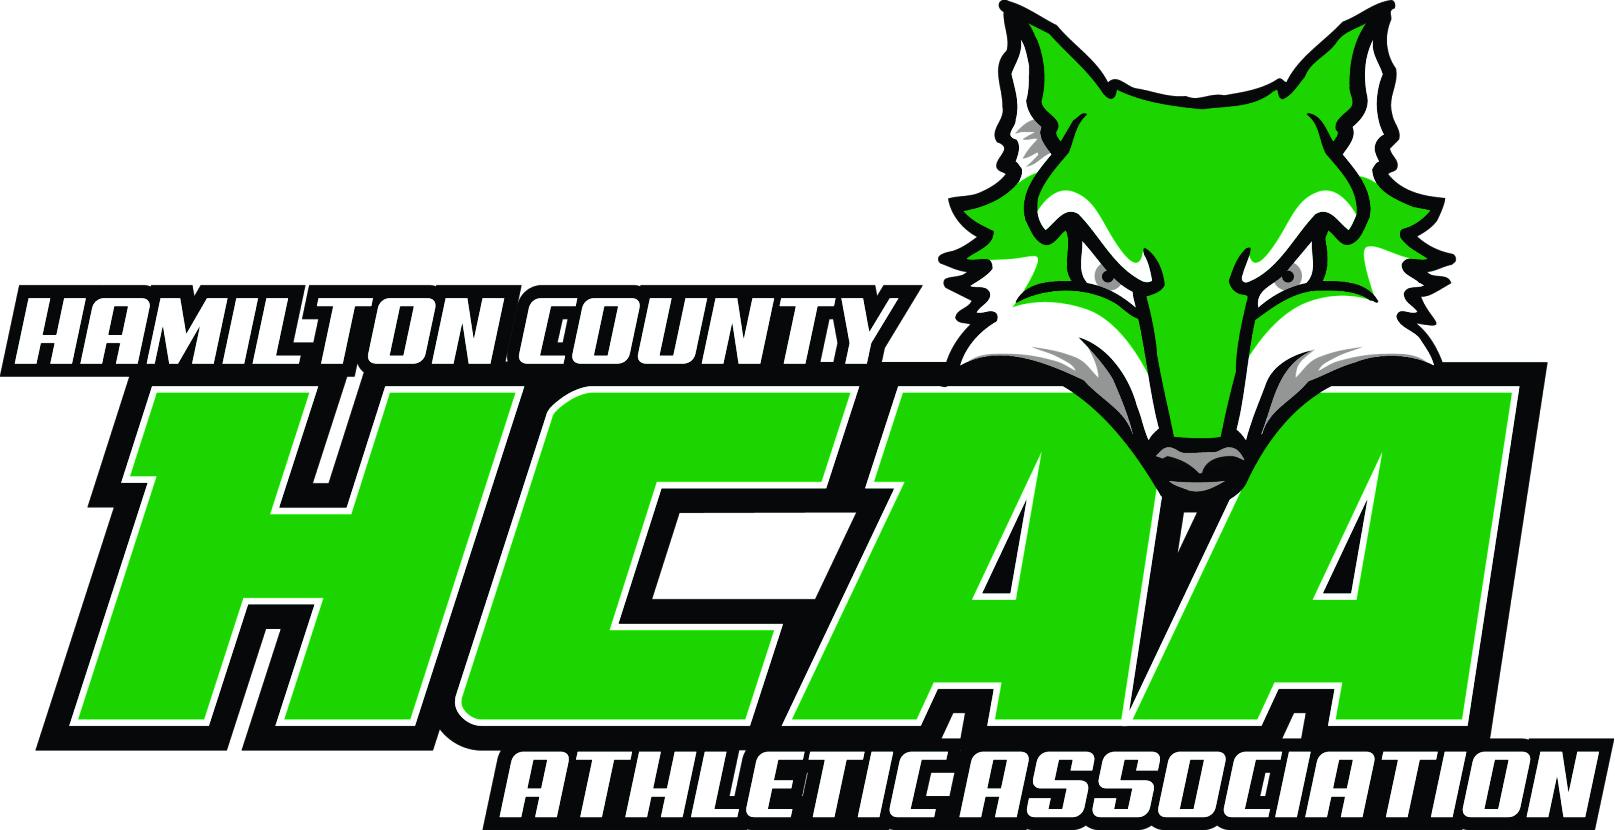 Hamilton County Athletic Association Logo